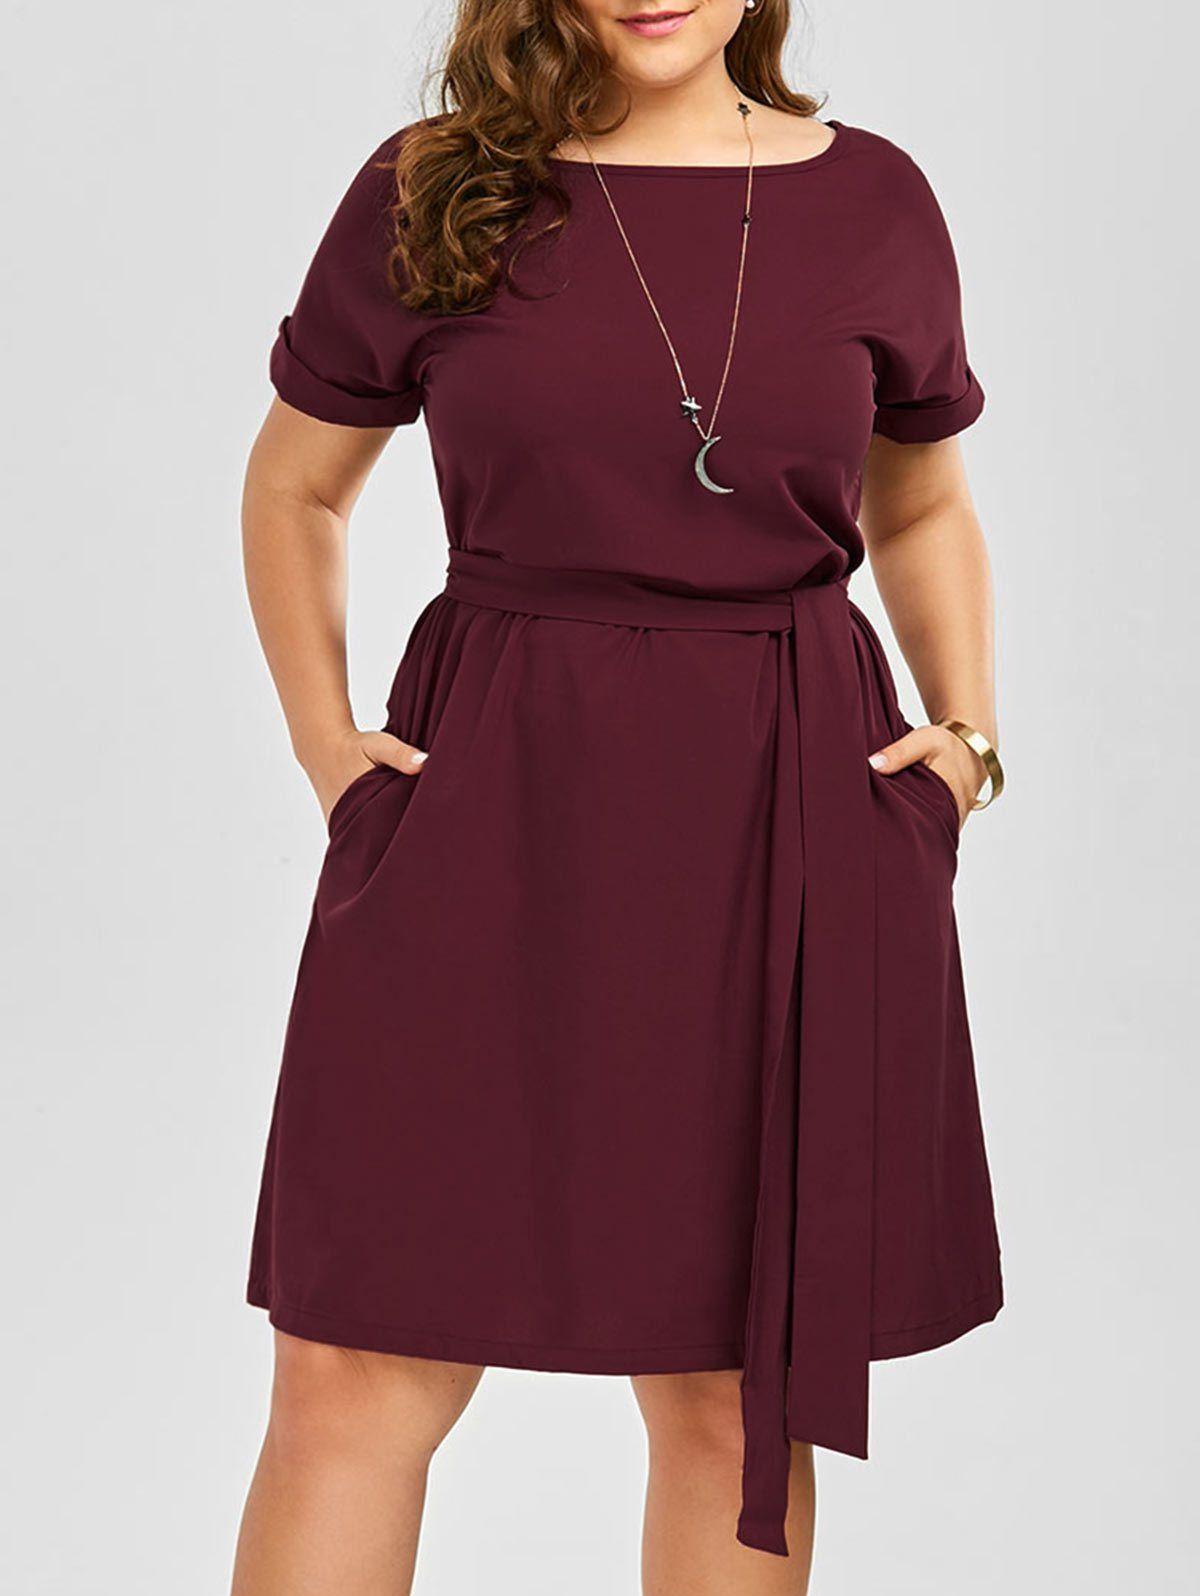 Gender  Women Brand Name  GAMISS Neckline  O-Neck Material  Polyester Model  Number  20170917 Dresses Length  Knee-Length Sleeve Length(cm)  Short  Style  ... 84561a22160c